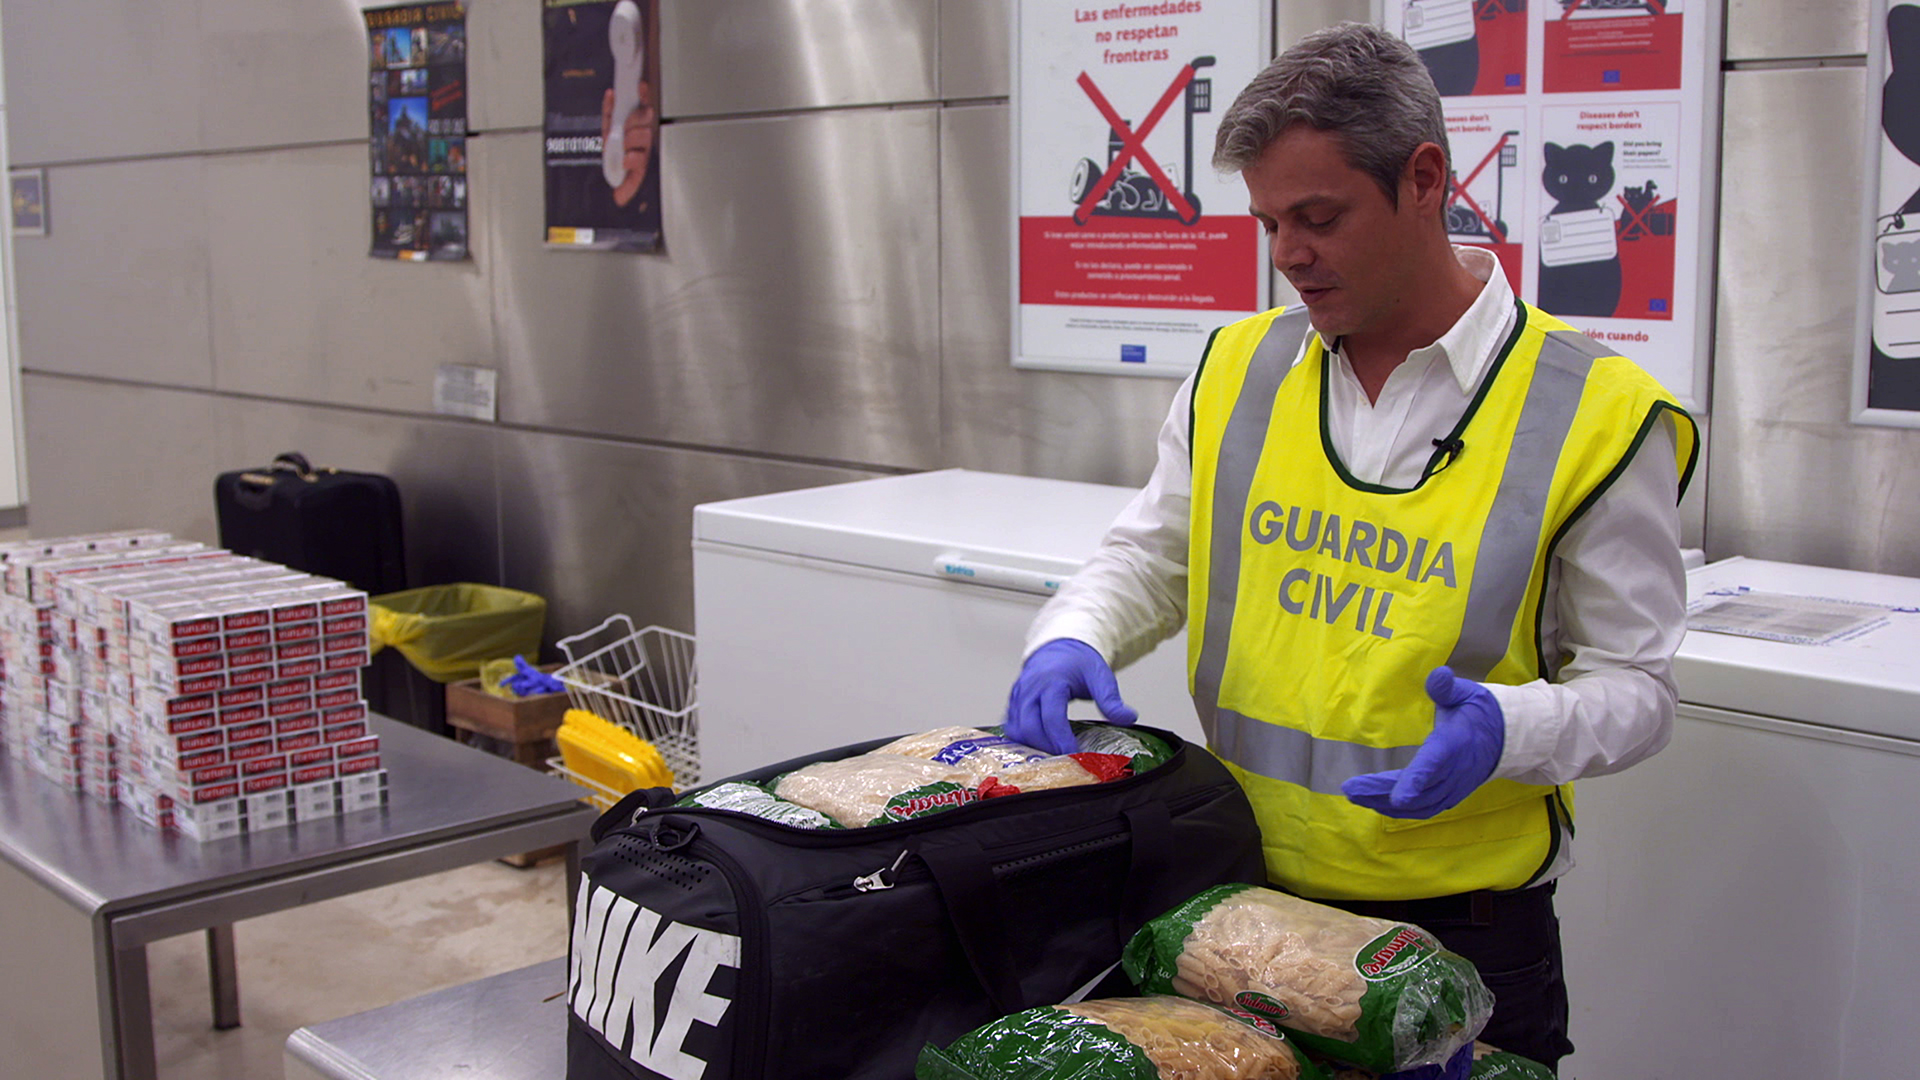 Airport Security: Spagna Stagione 5 (2019).mkv [20/20] WEBRip 720p AAC iTA